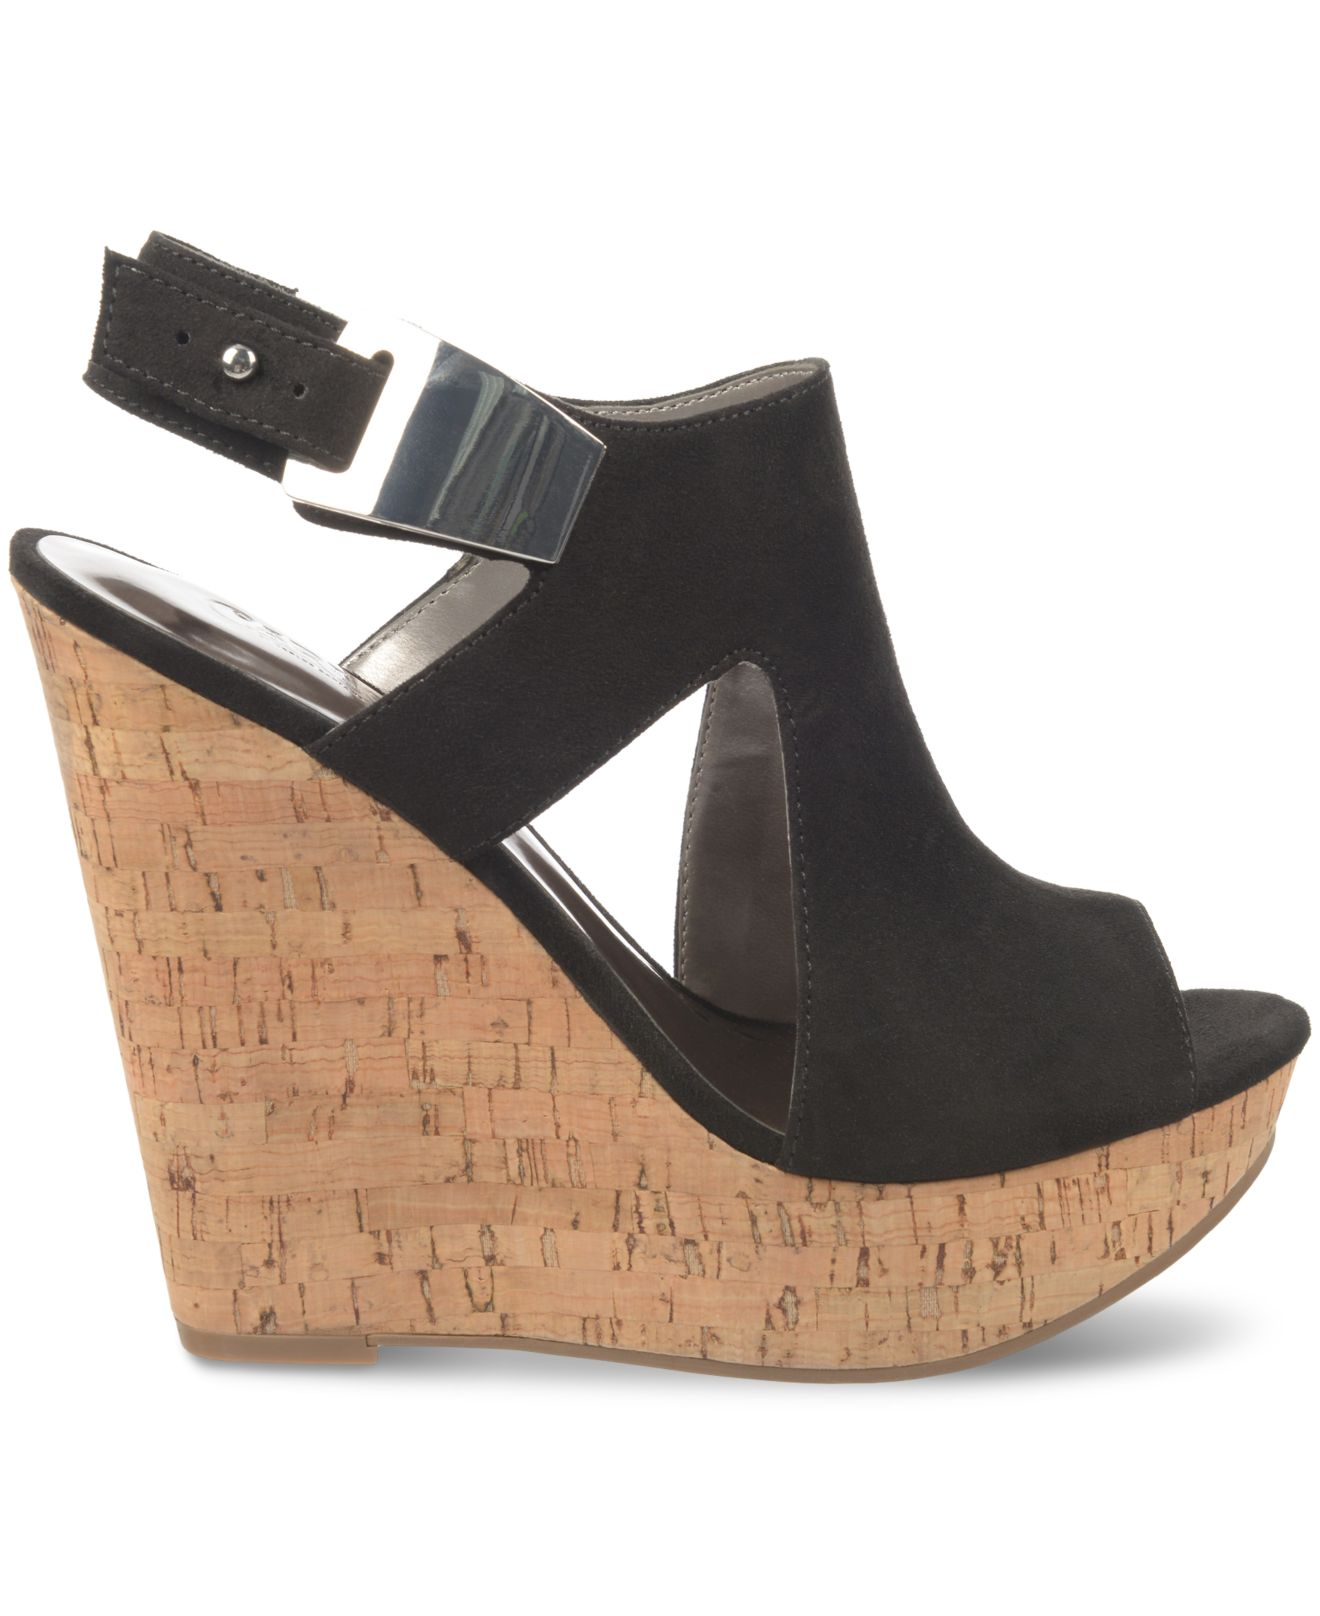 carlos by carlos santana malor platform wedge sandals in